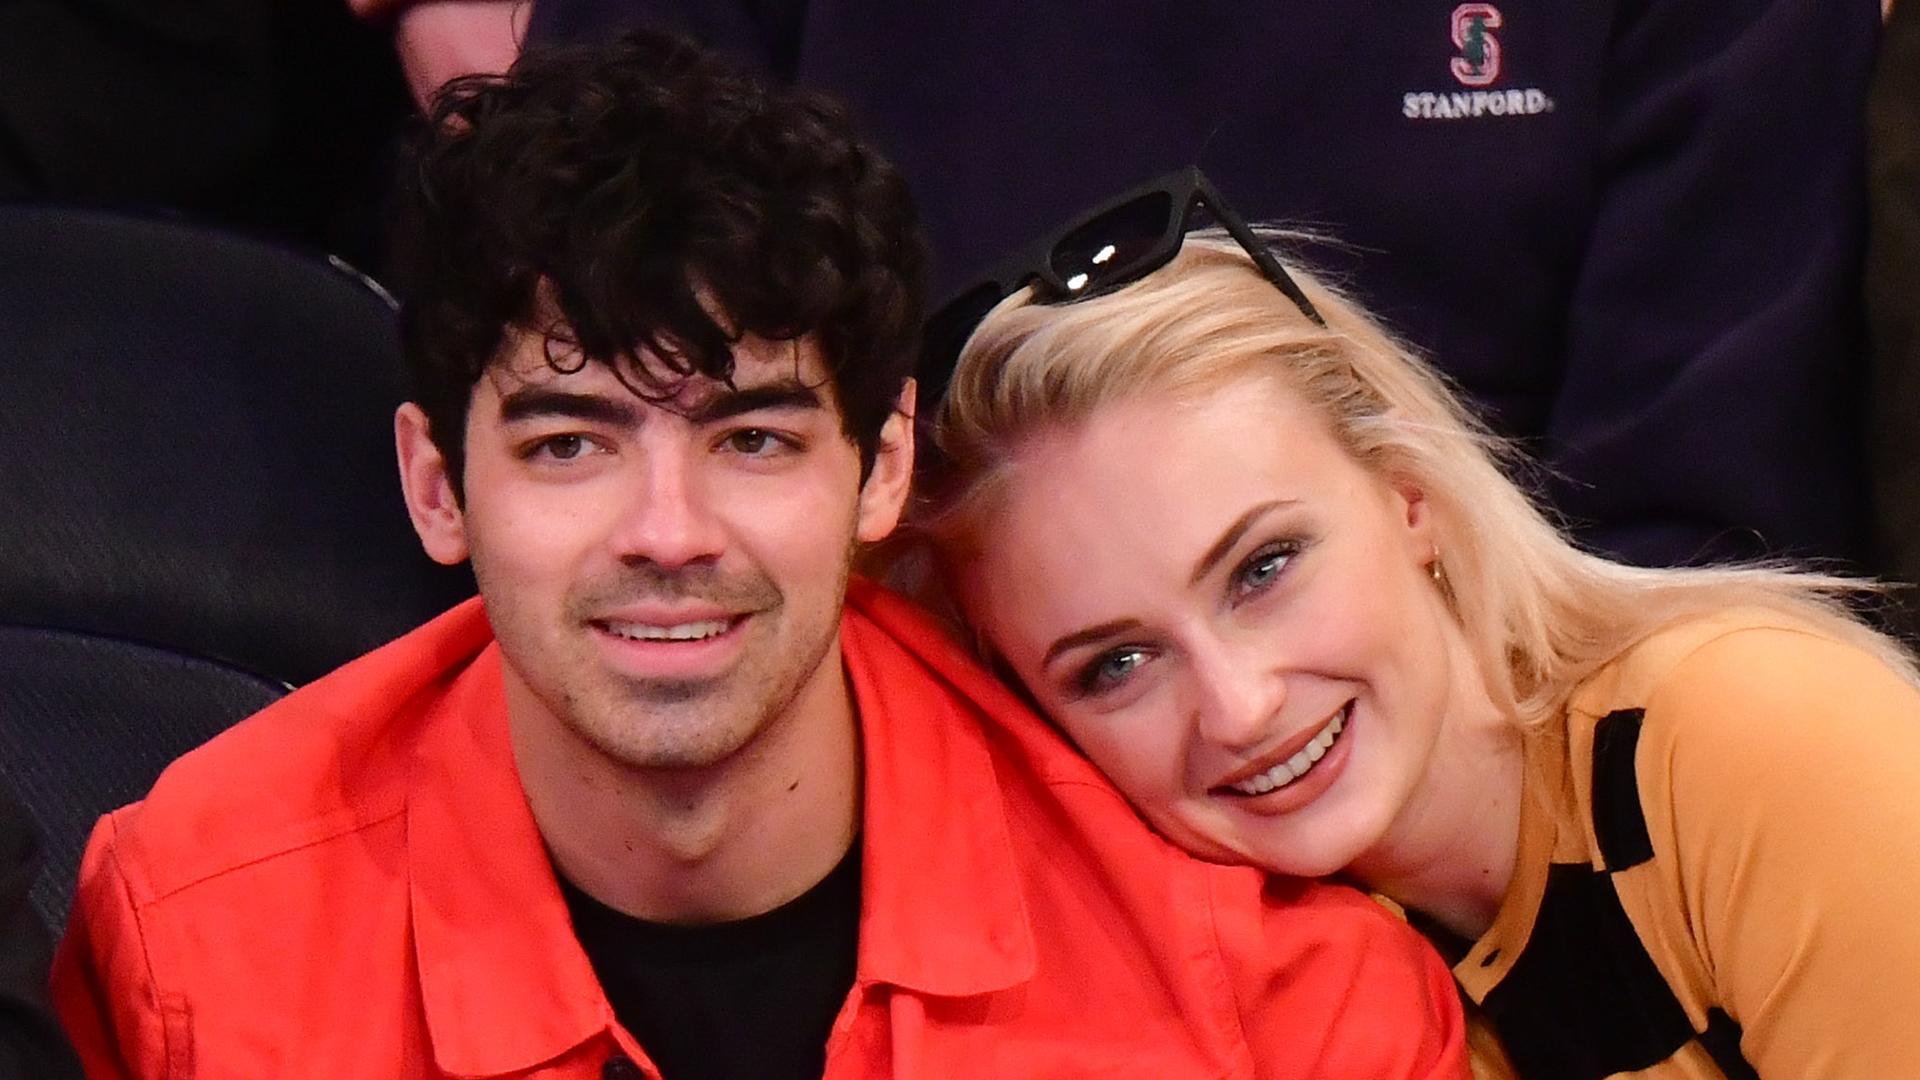 Joe Jonas & Sophie Turner Show Off Relatable Home Life In Rare TikTok Video